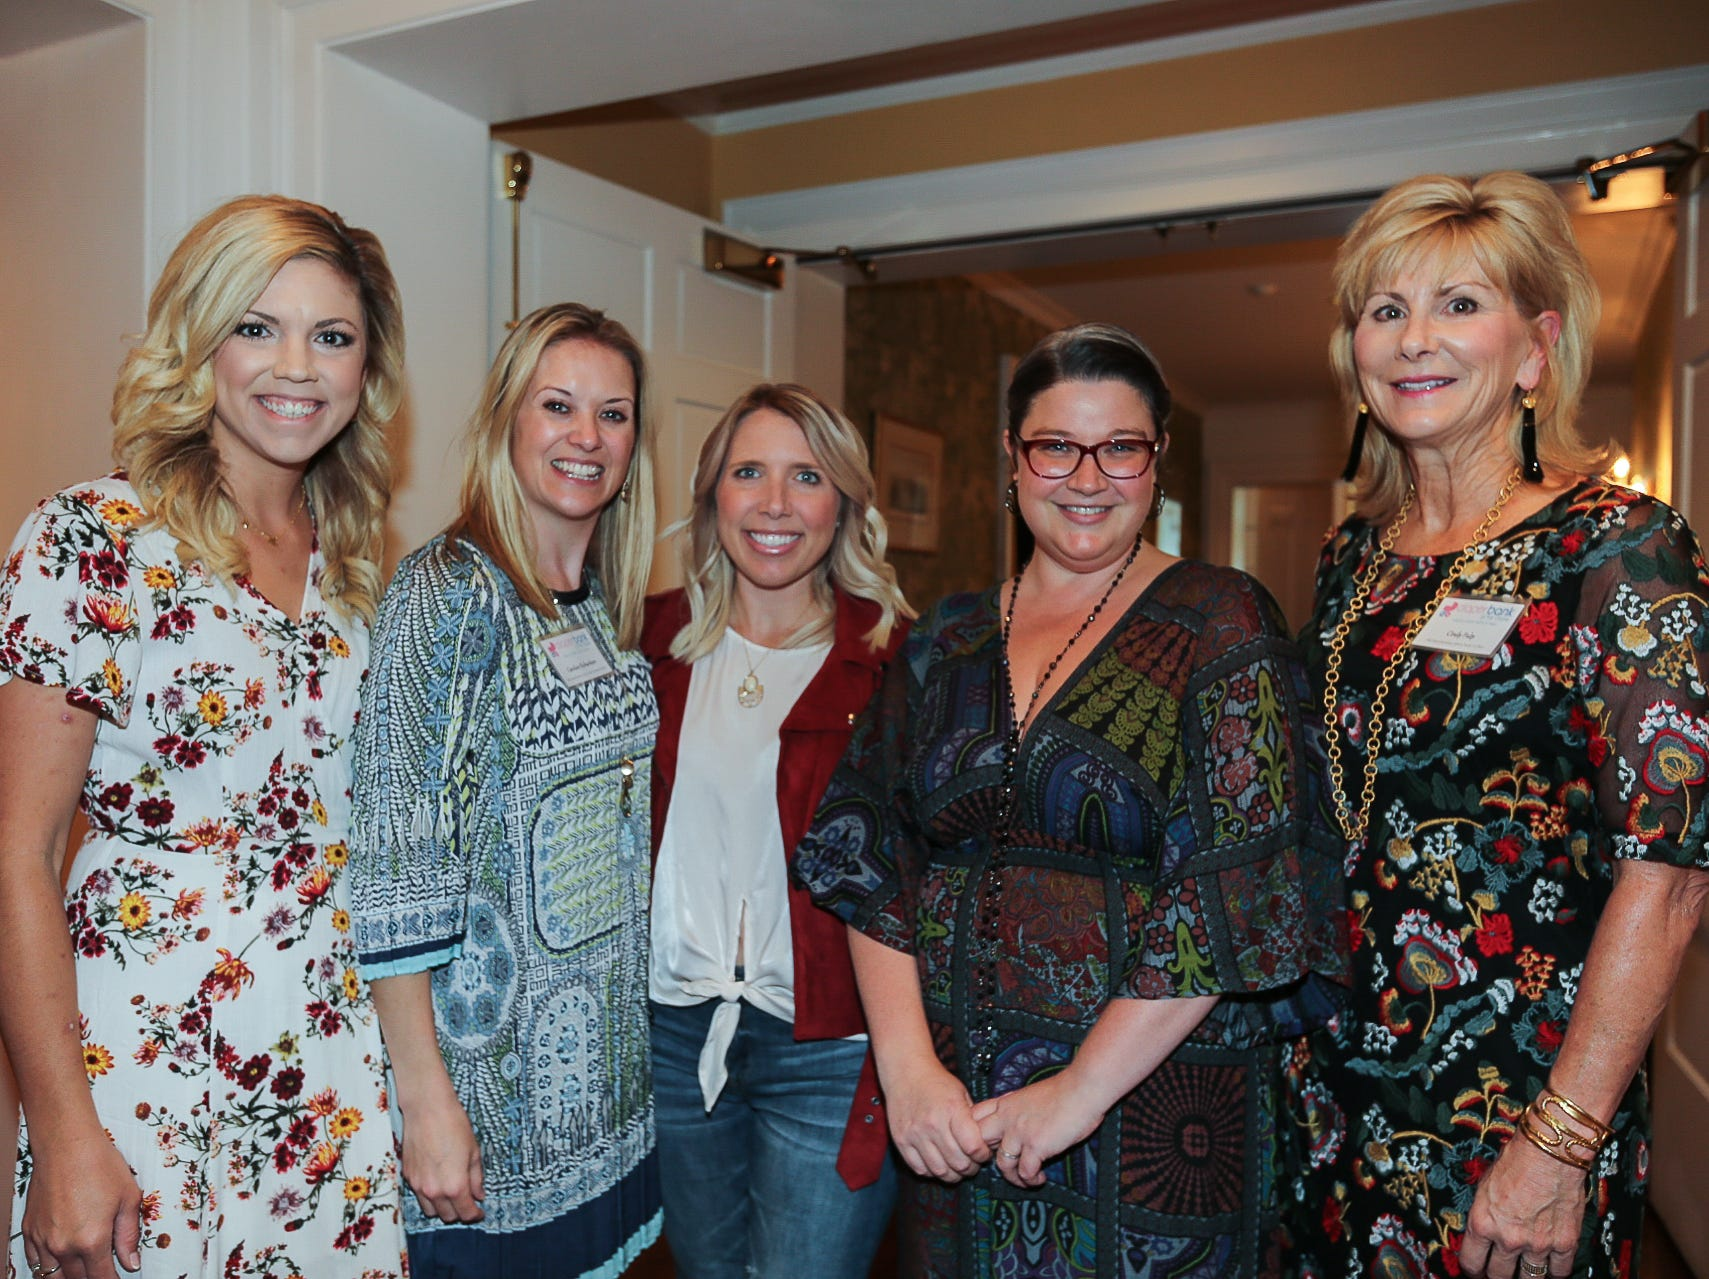 Ashley O'Sullivan, Caroline Richardson, Amy Henson, and Cindy Fulp